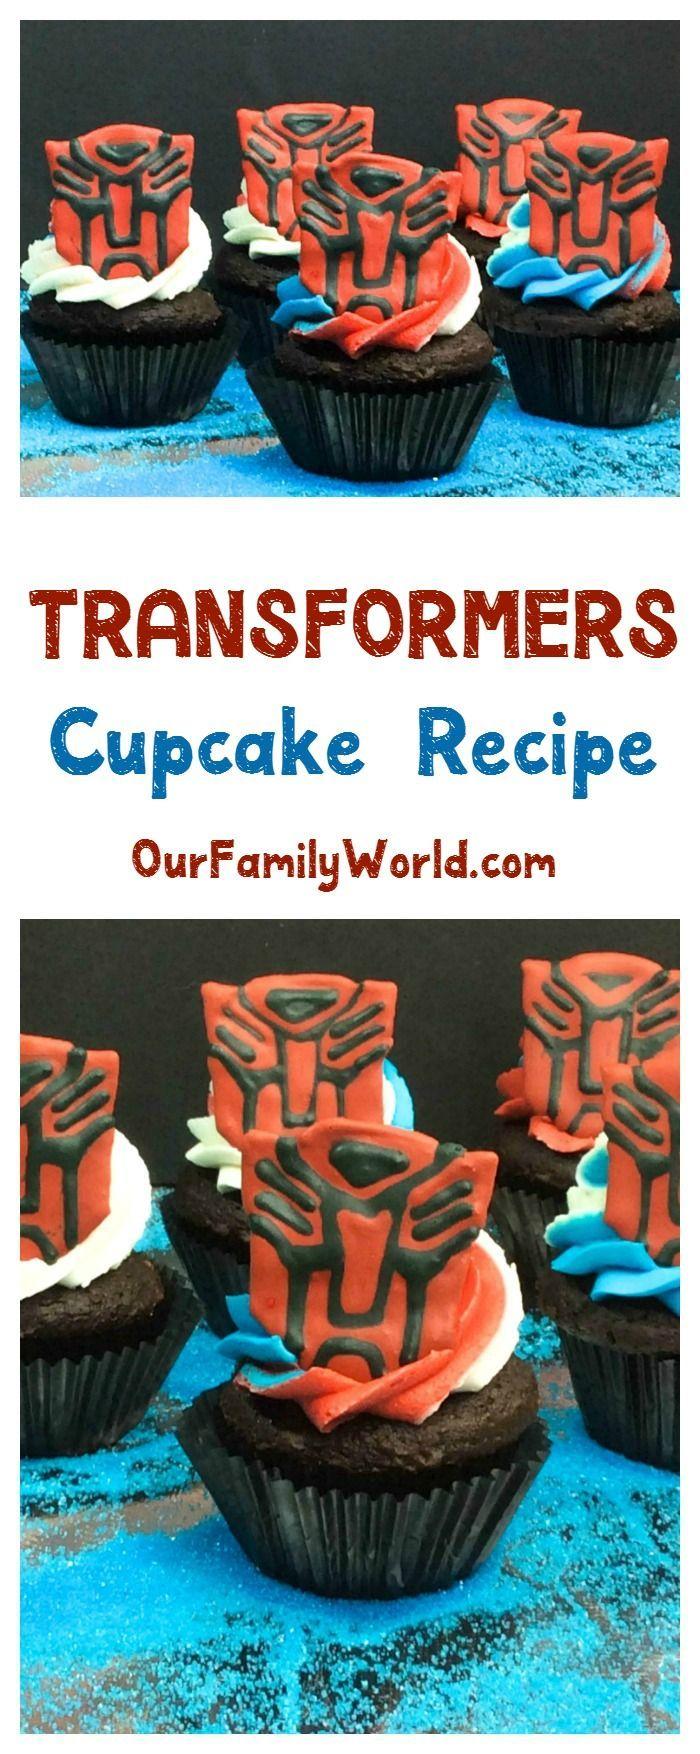 Your favorite autobot recipe transformers cupcakes birthday fun